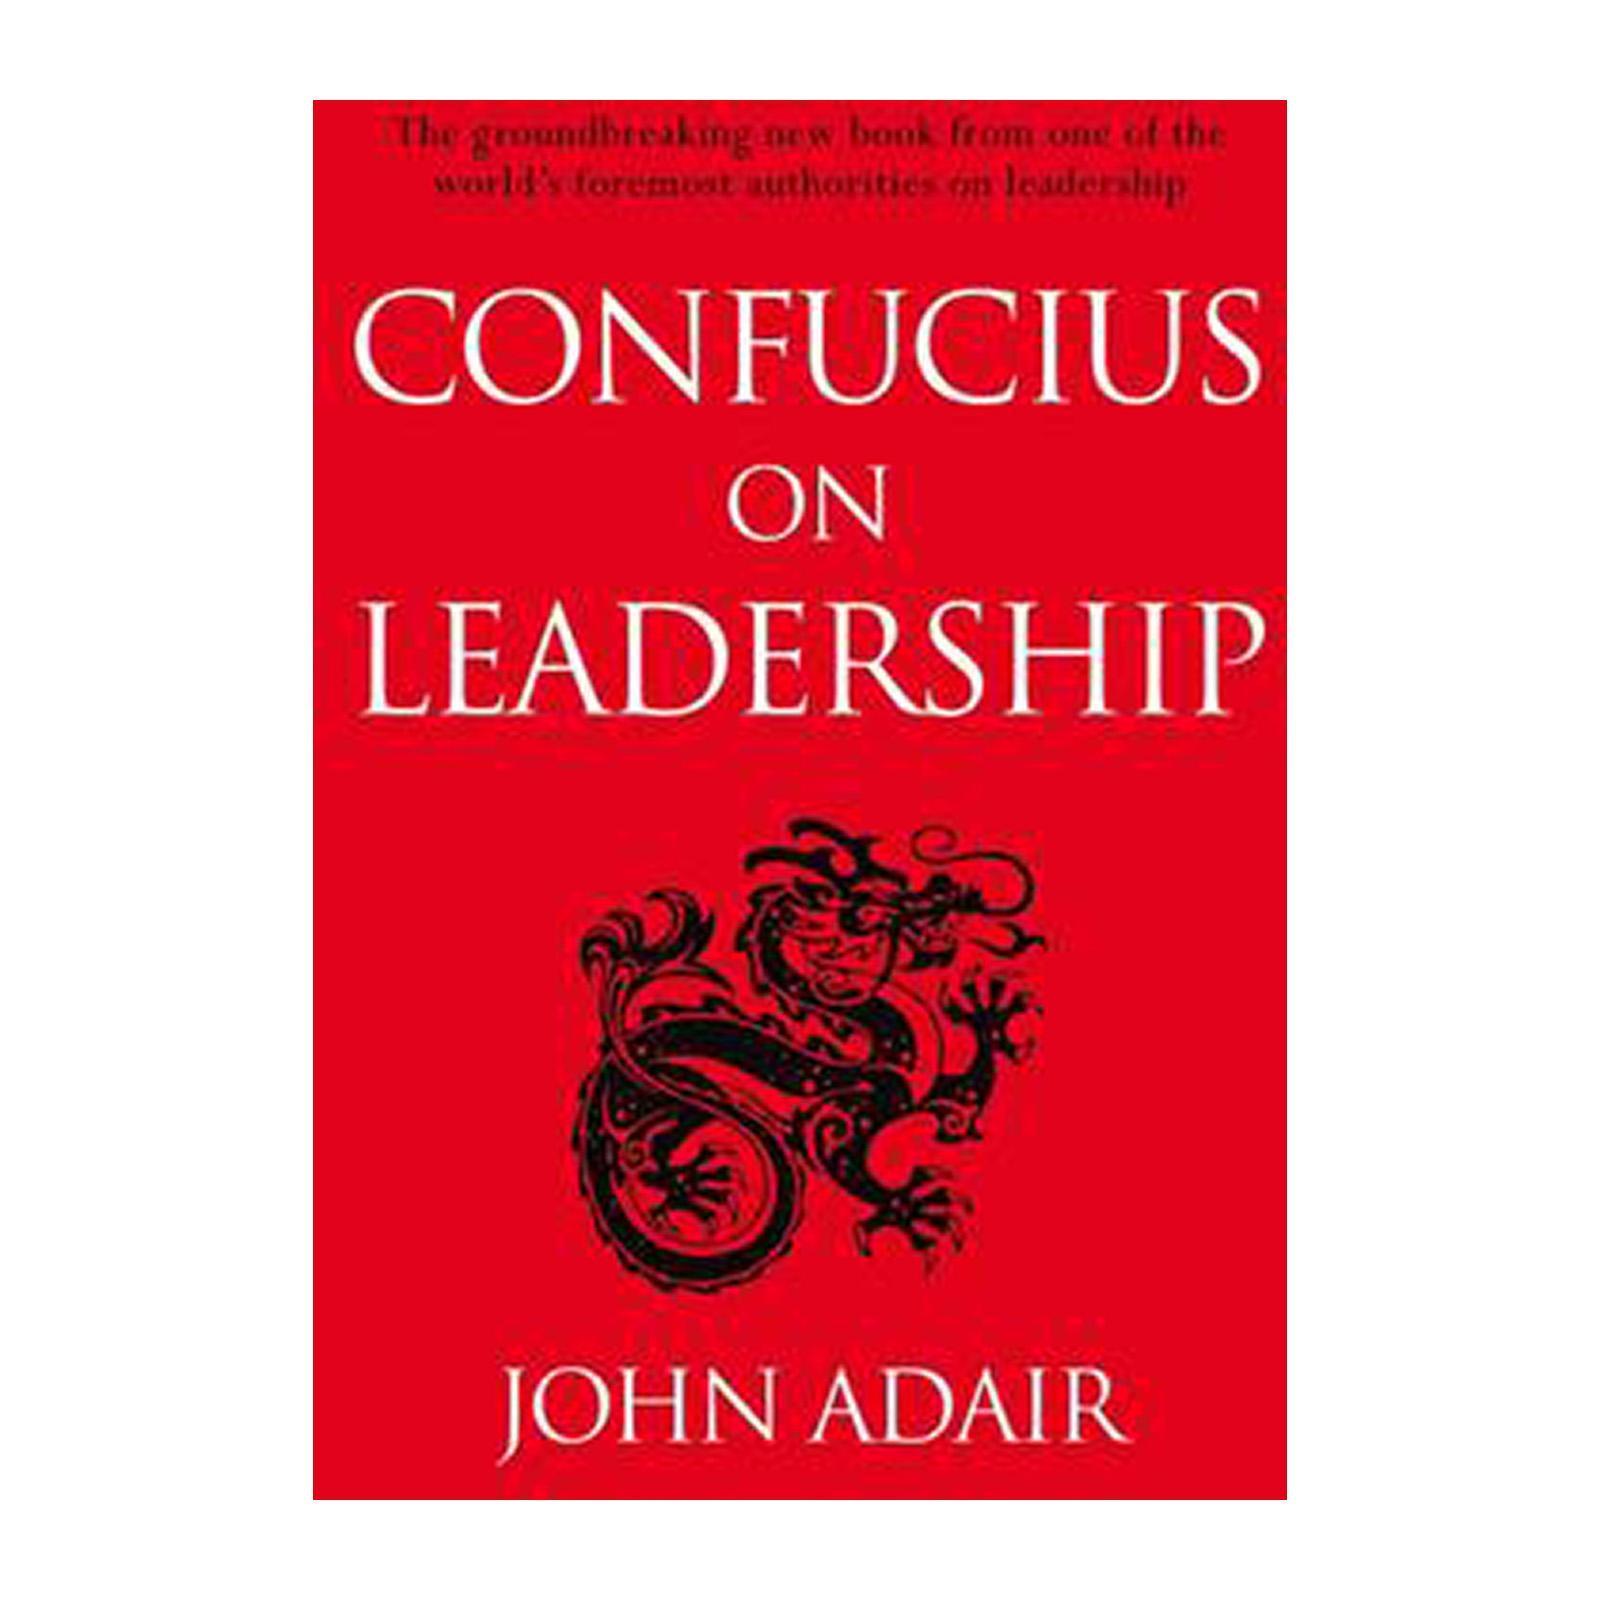 Confucius On Leadership (Paperback)